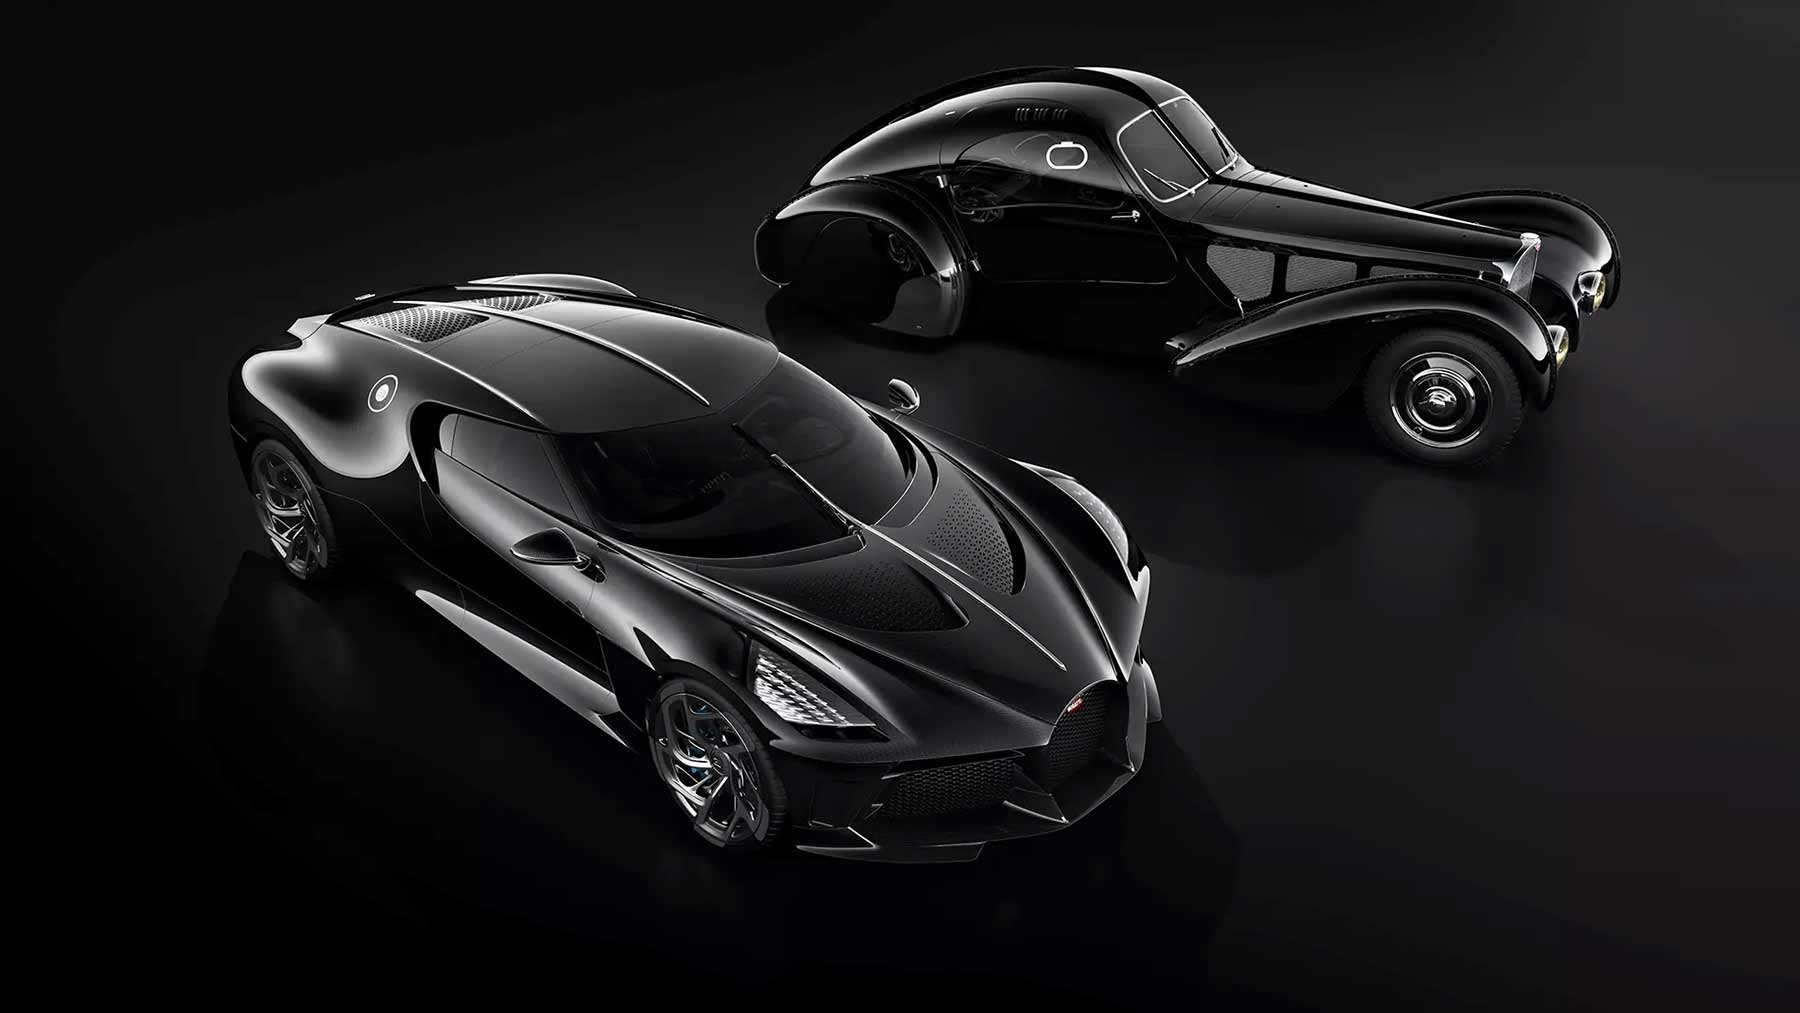 Bugatti La Voiture Noire Bugatti-La-Voiture-Noire_02